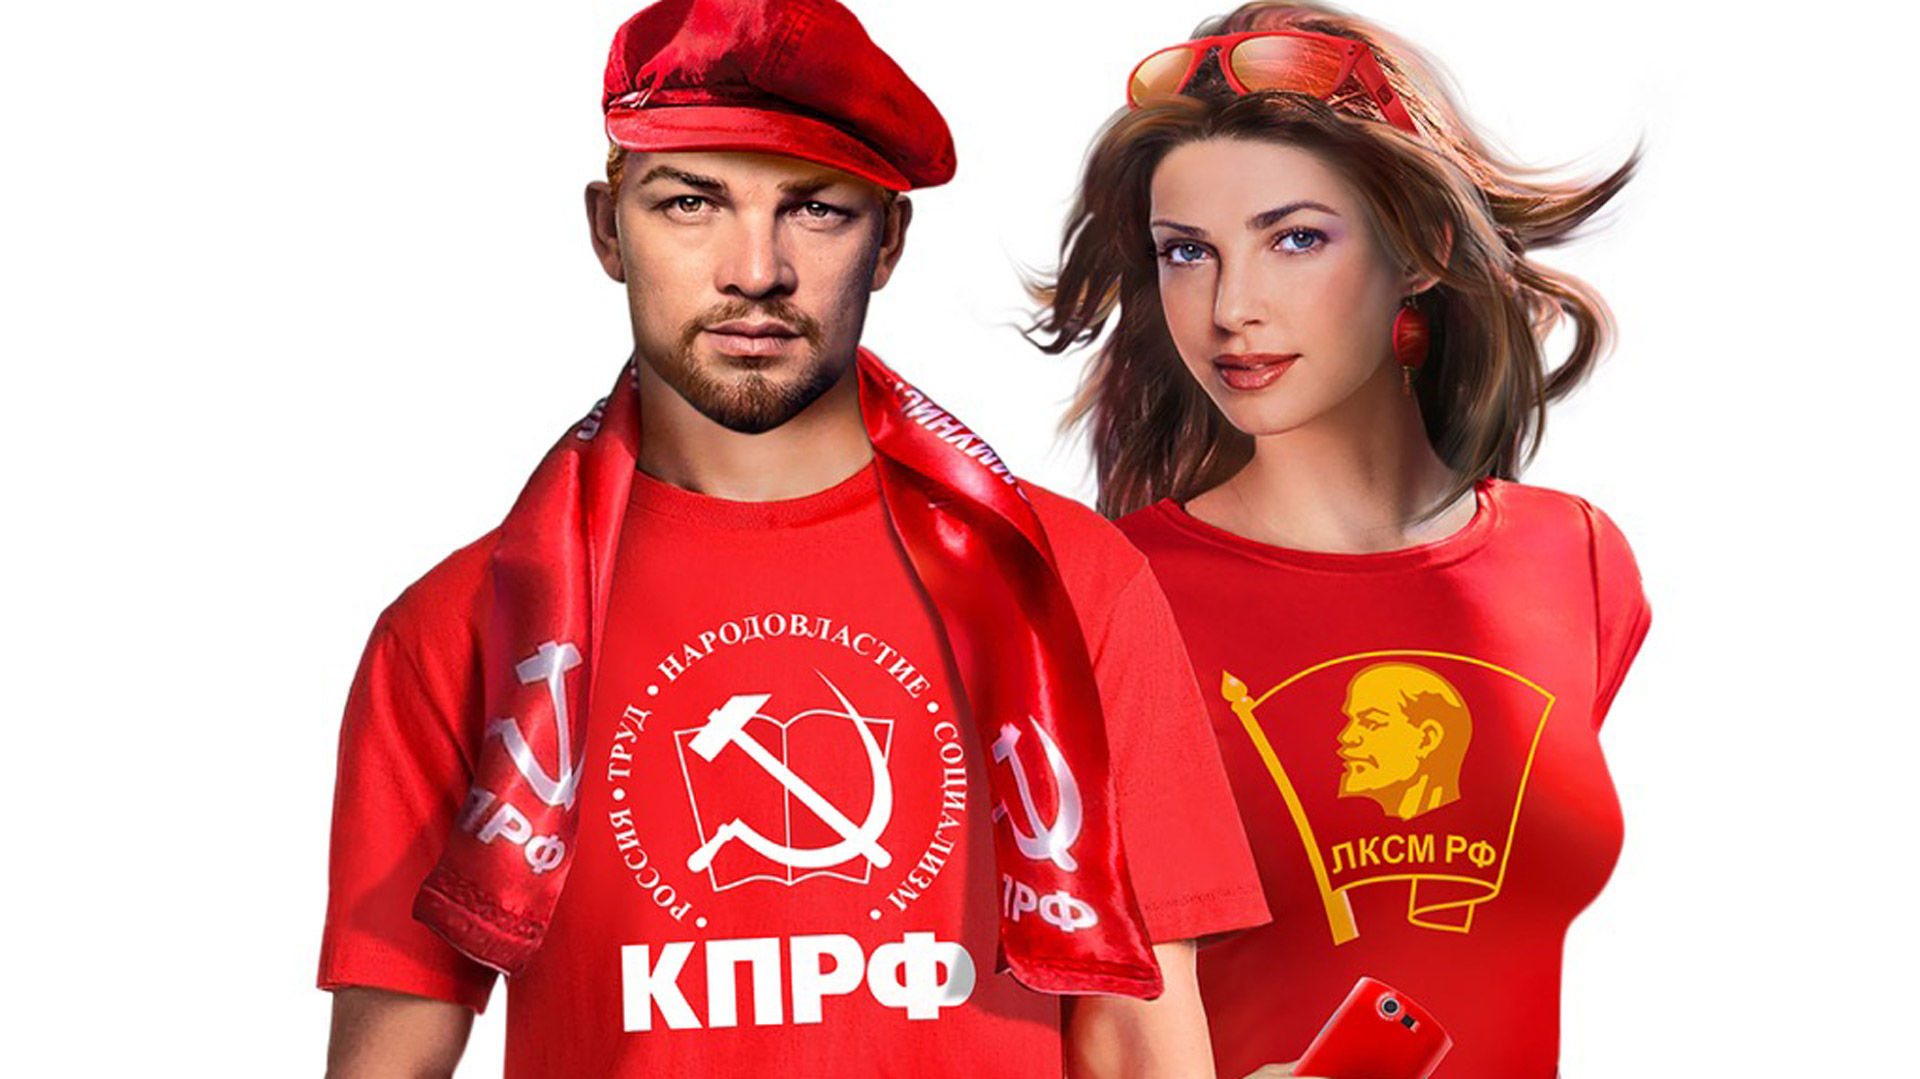 "<p>Автор плаката:&nbsp;Игорь Петрыгин-Родионов</p> <p class=""p1"">&nbsp;</p>"